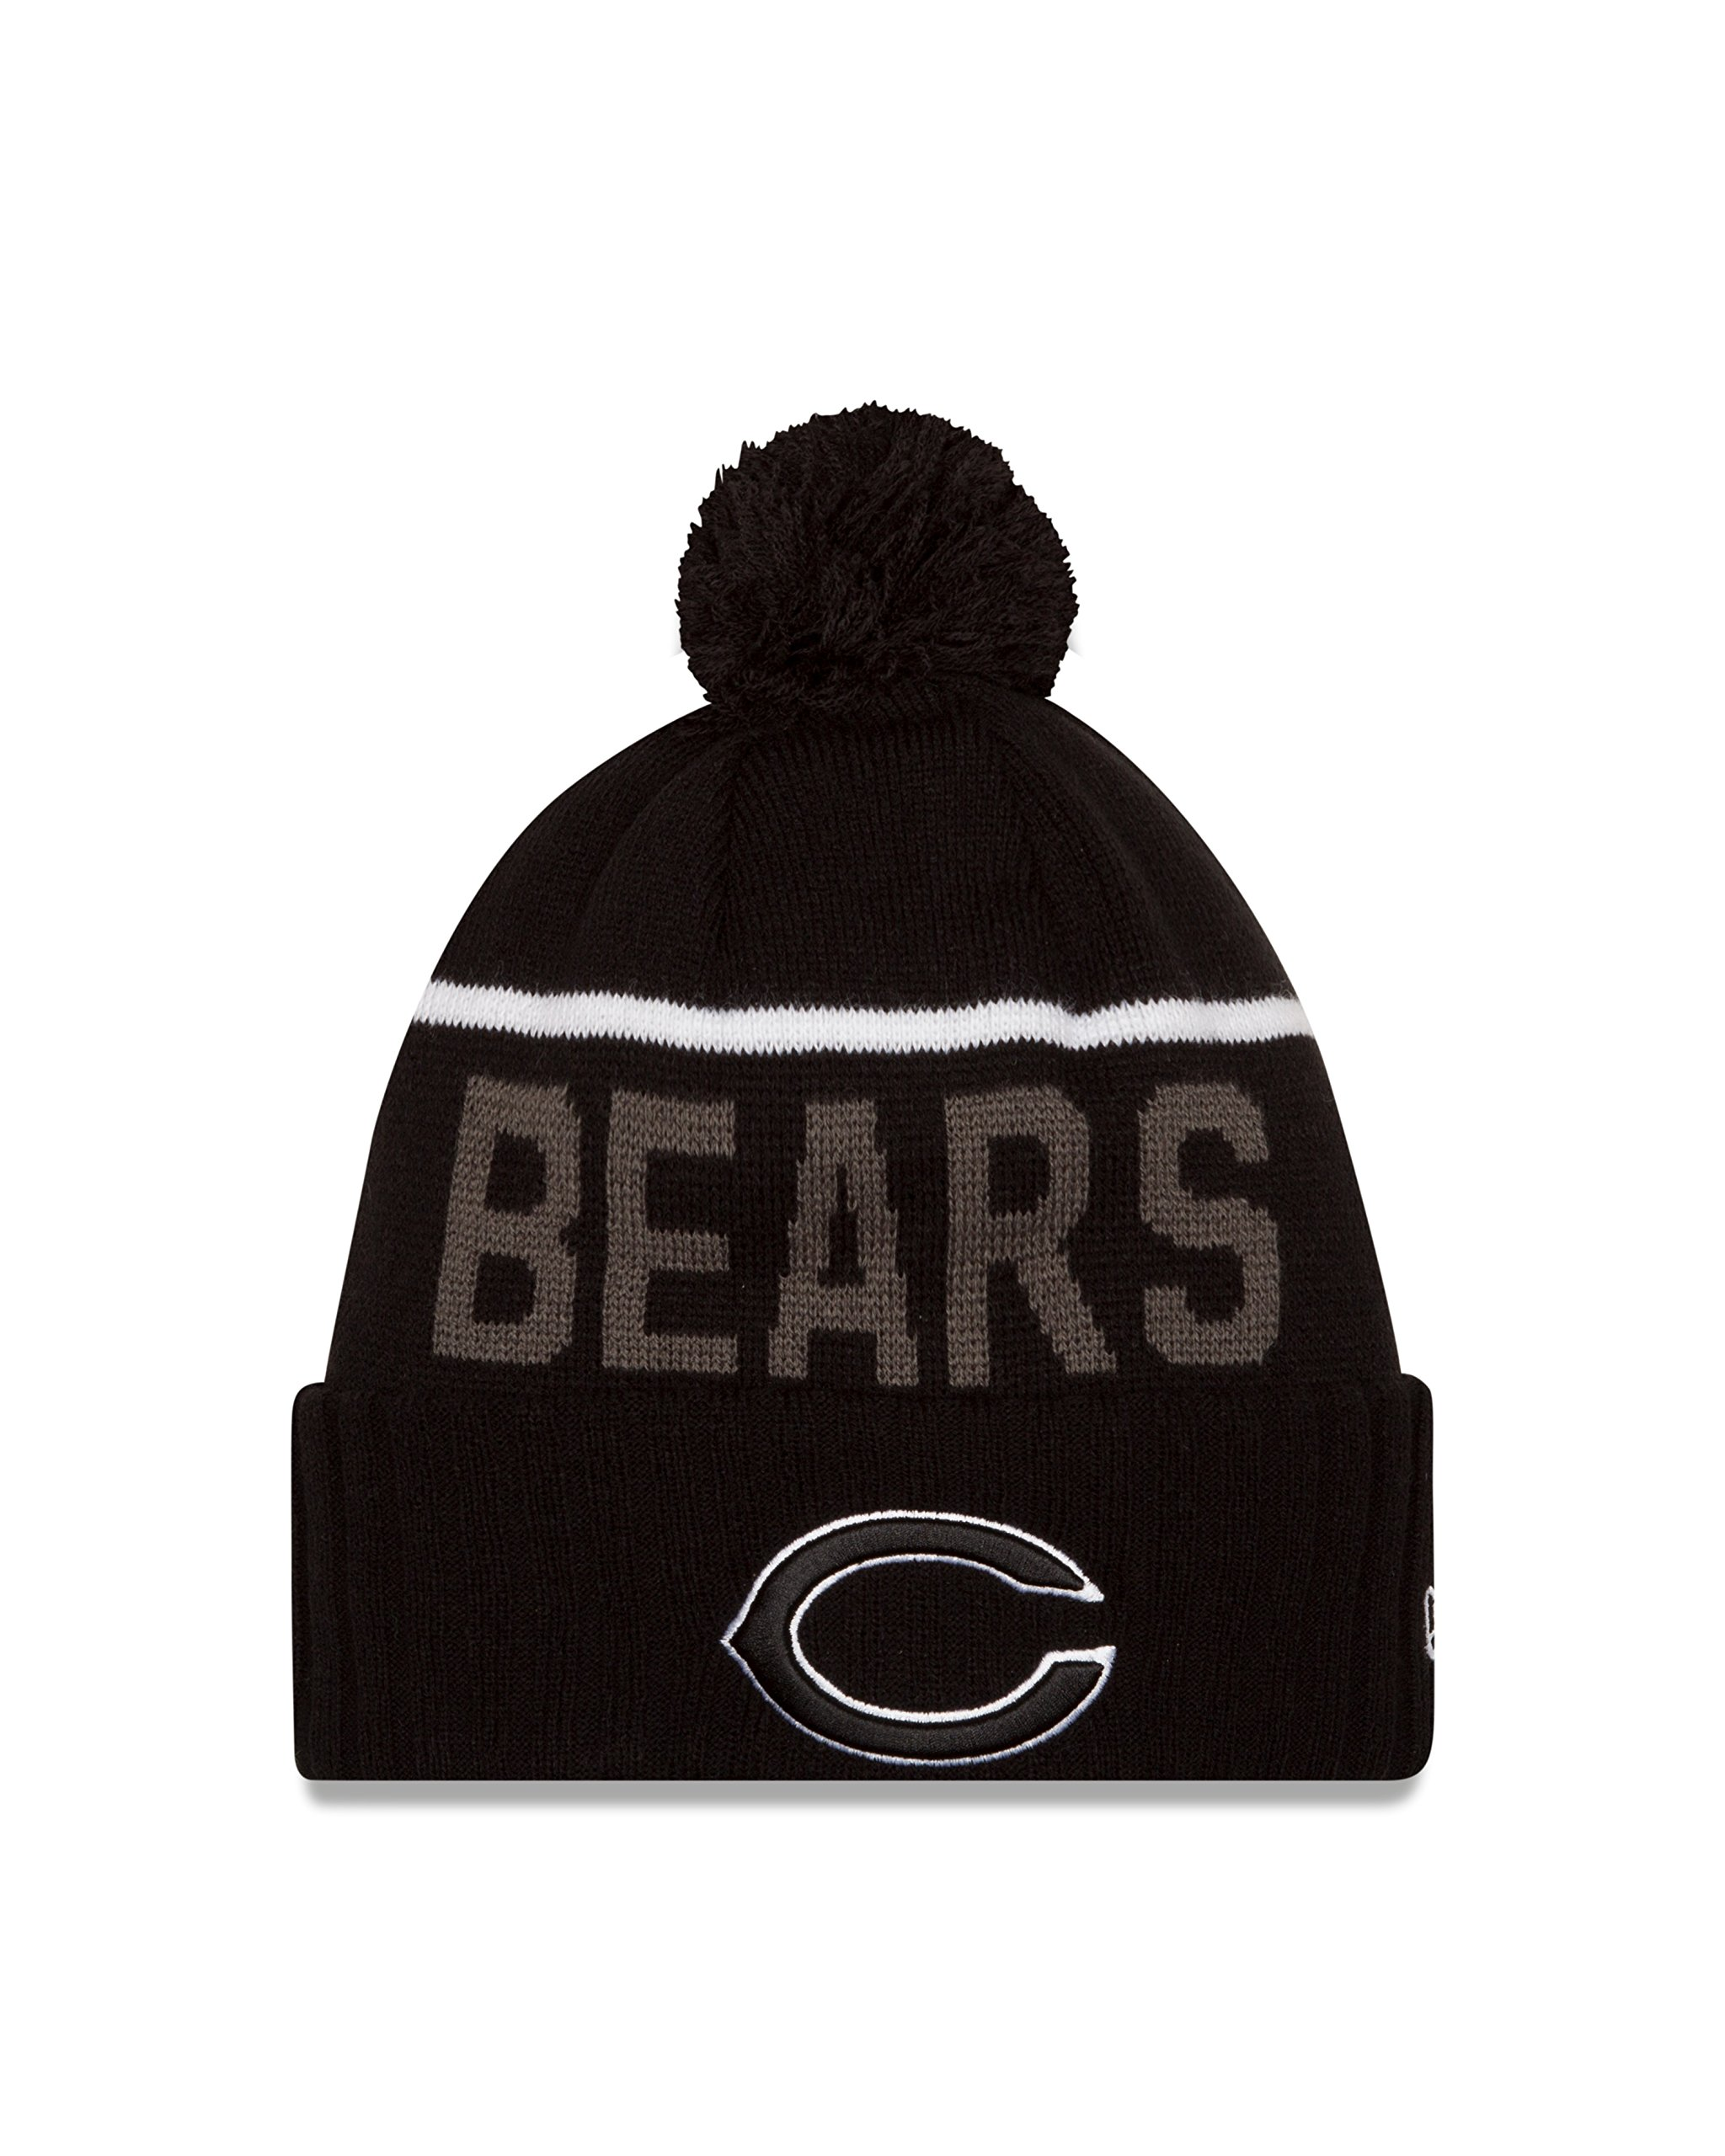 NFL Chicago Bears 2015 Sport Knit, Black, One Size